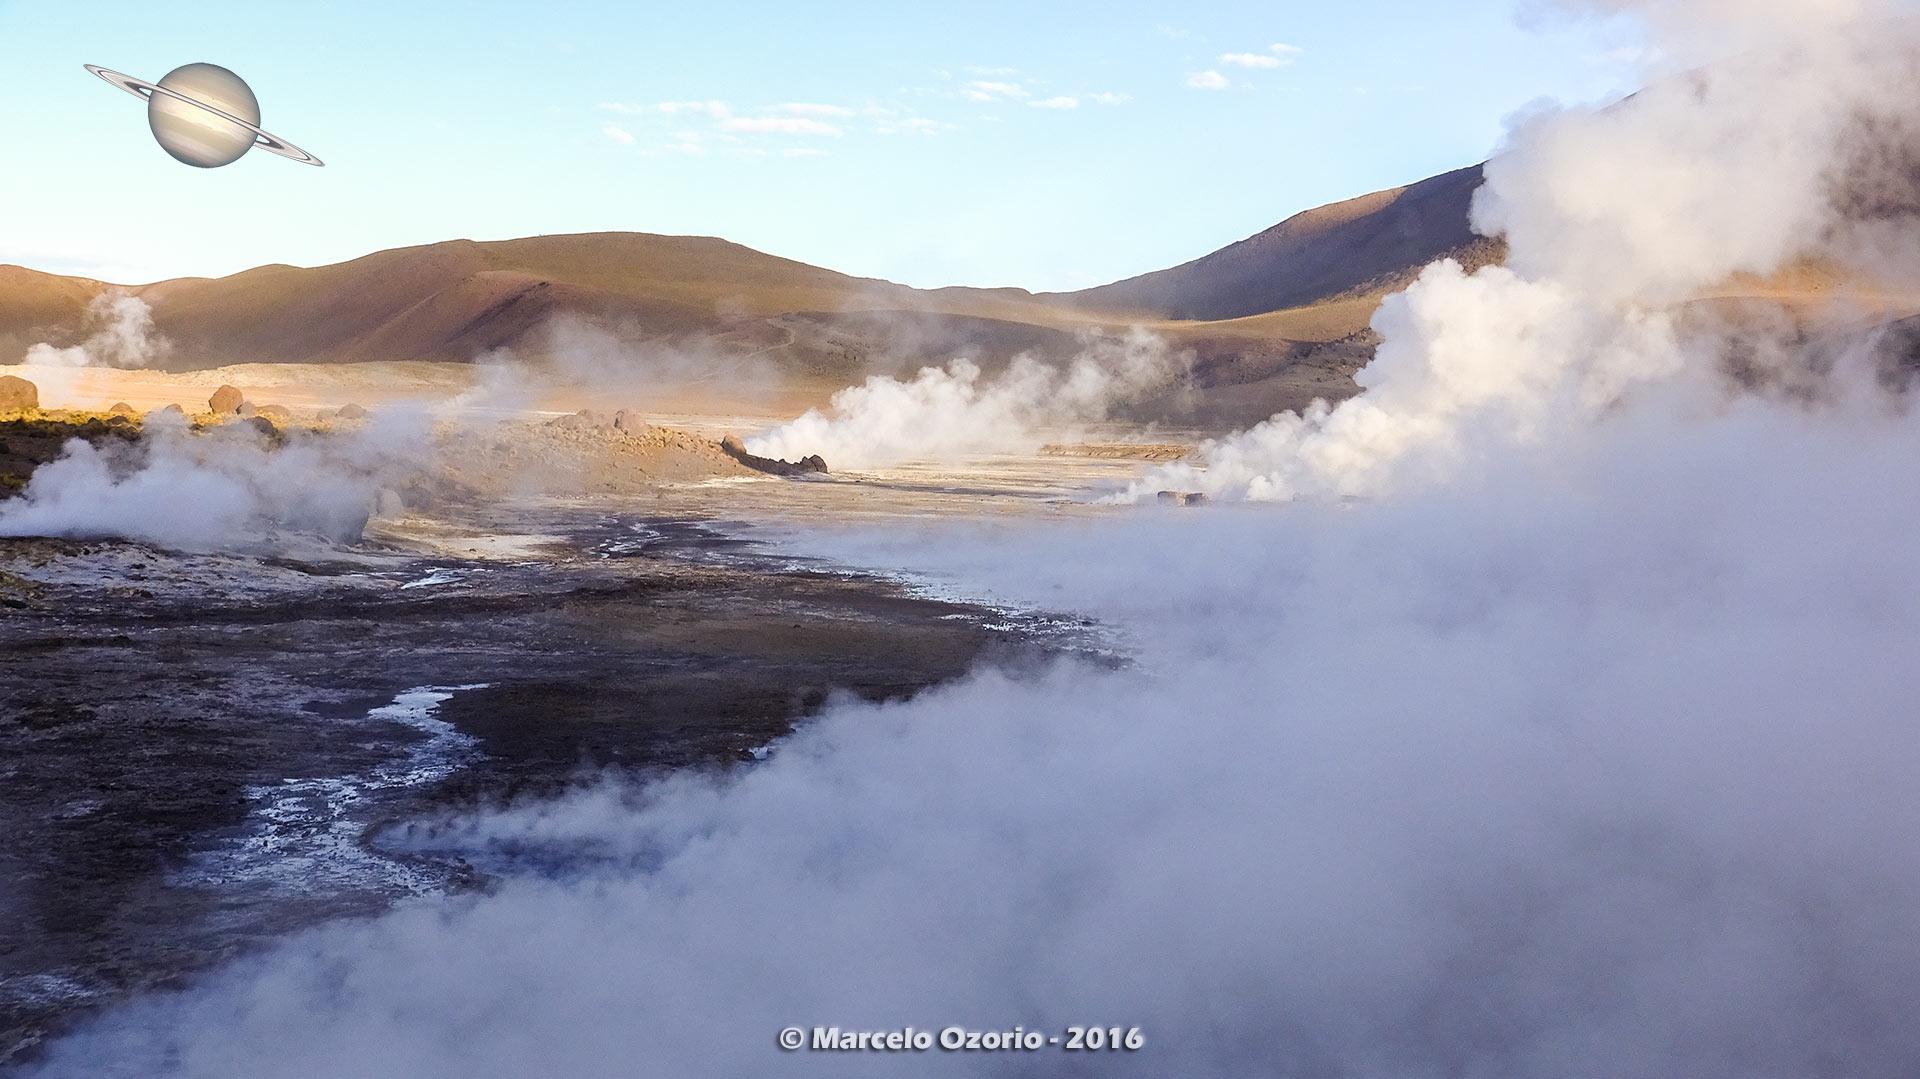 el tatio geysers atacama desert 13 - Os Surreais Gêiseres El Tatio - Deserto do Atacama - Chile